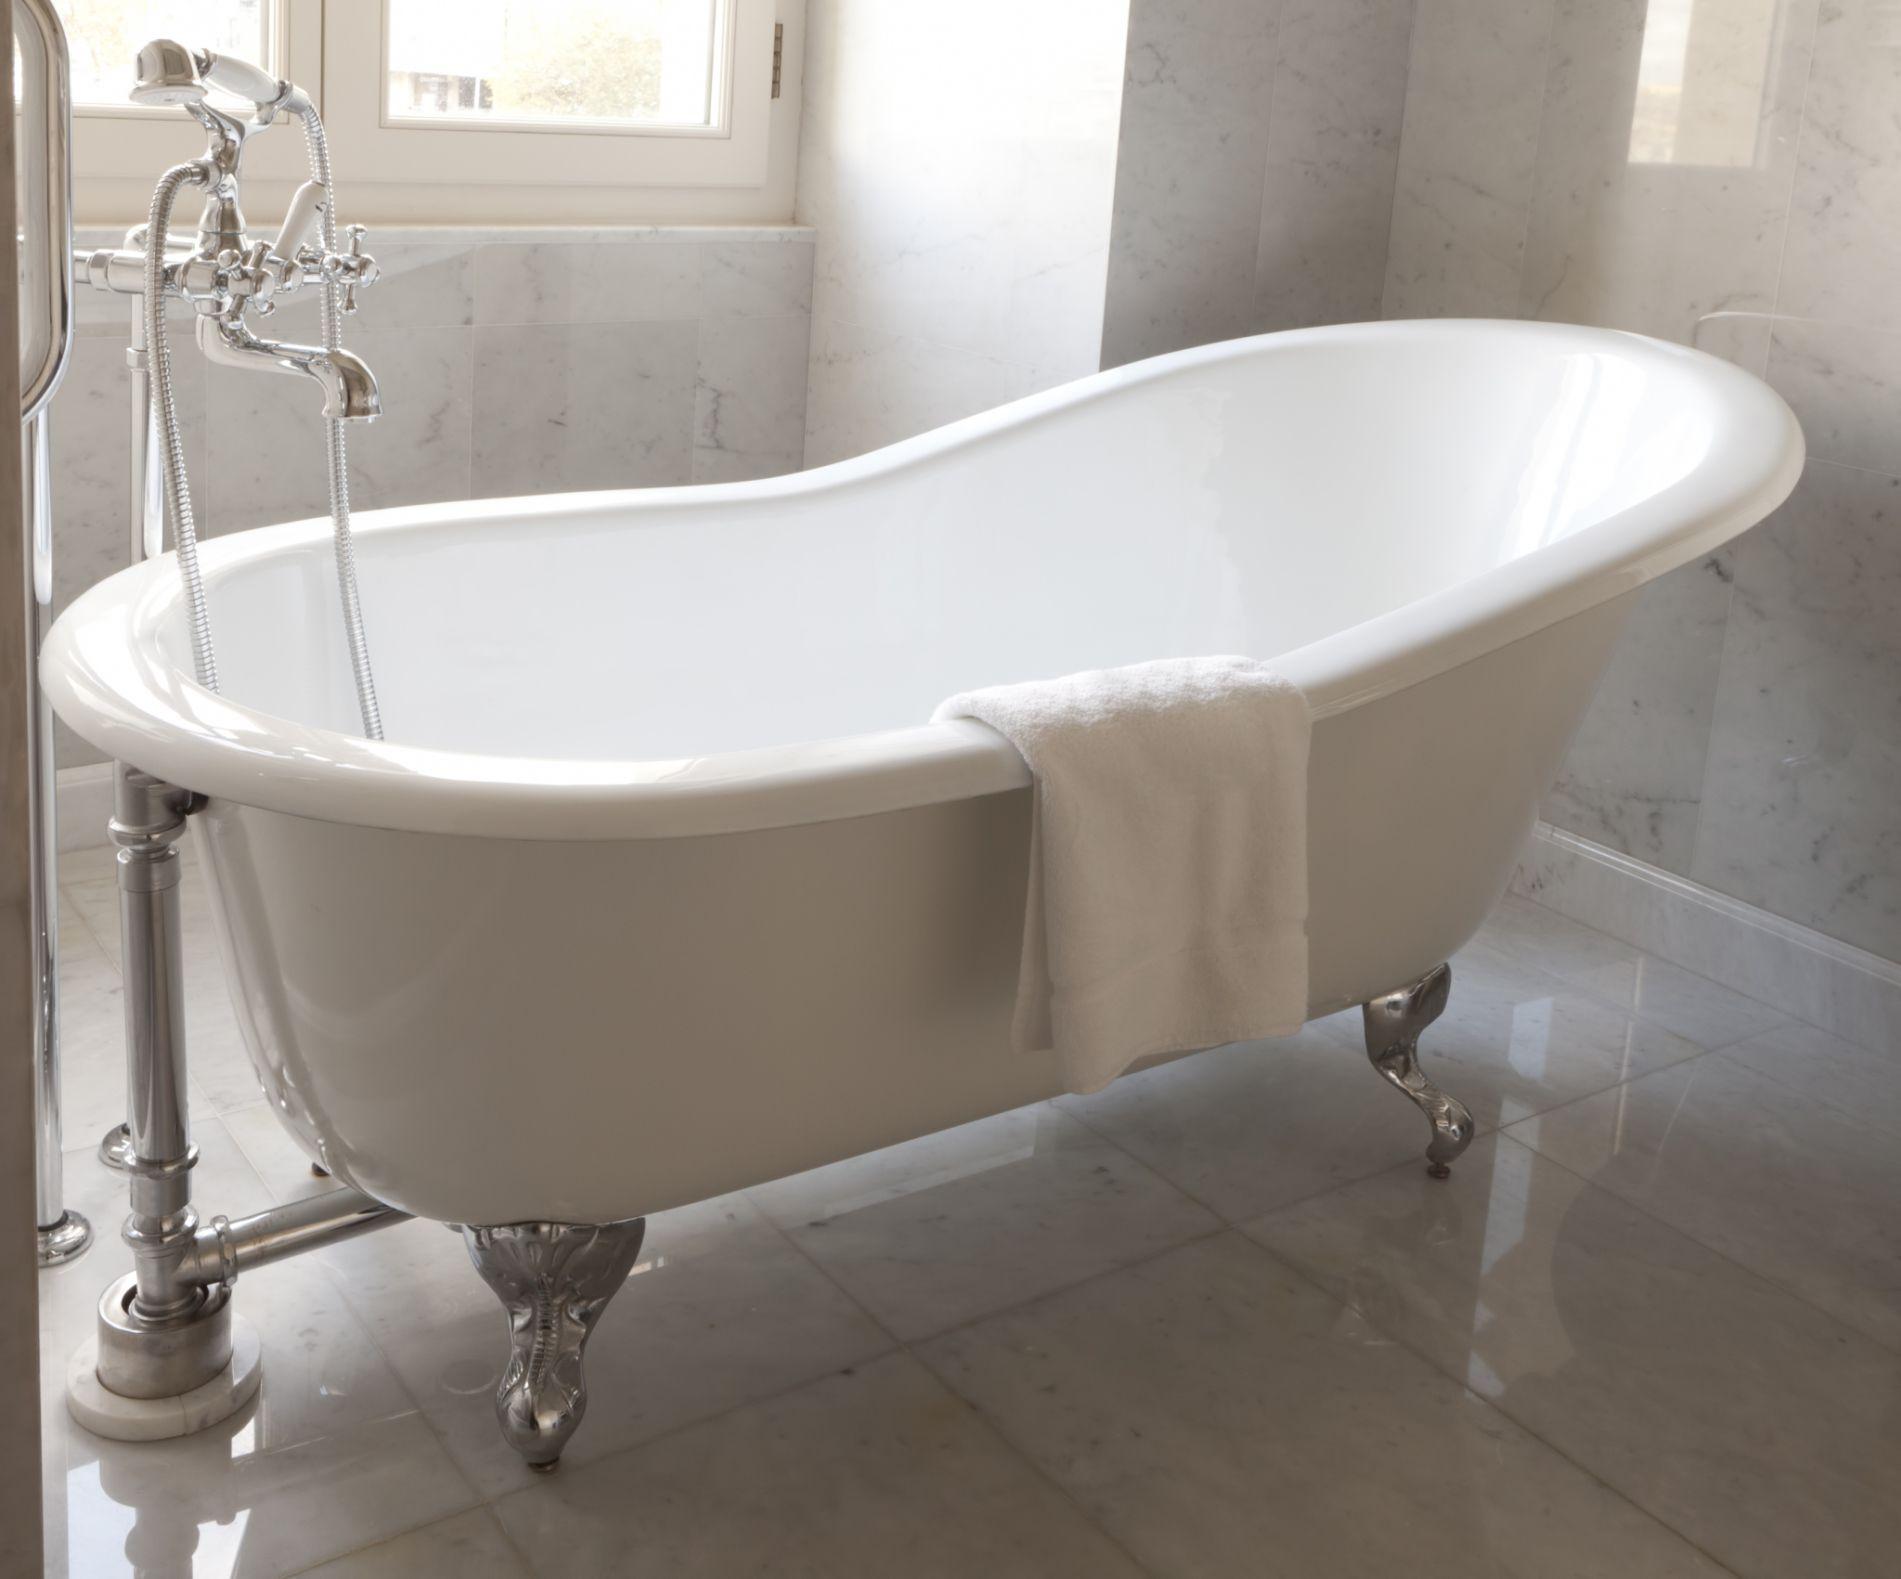 Bathworks diy refinishing kit for Bathroom tubs